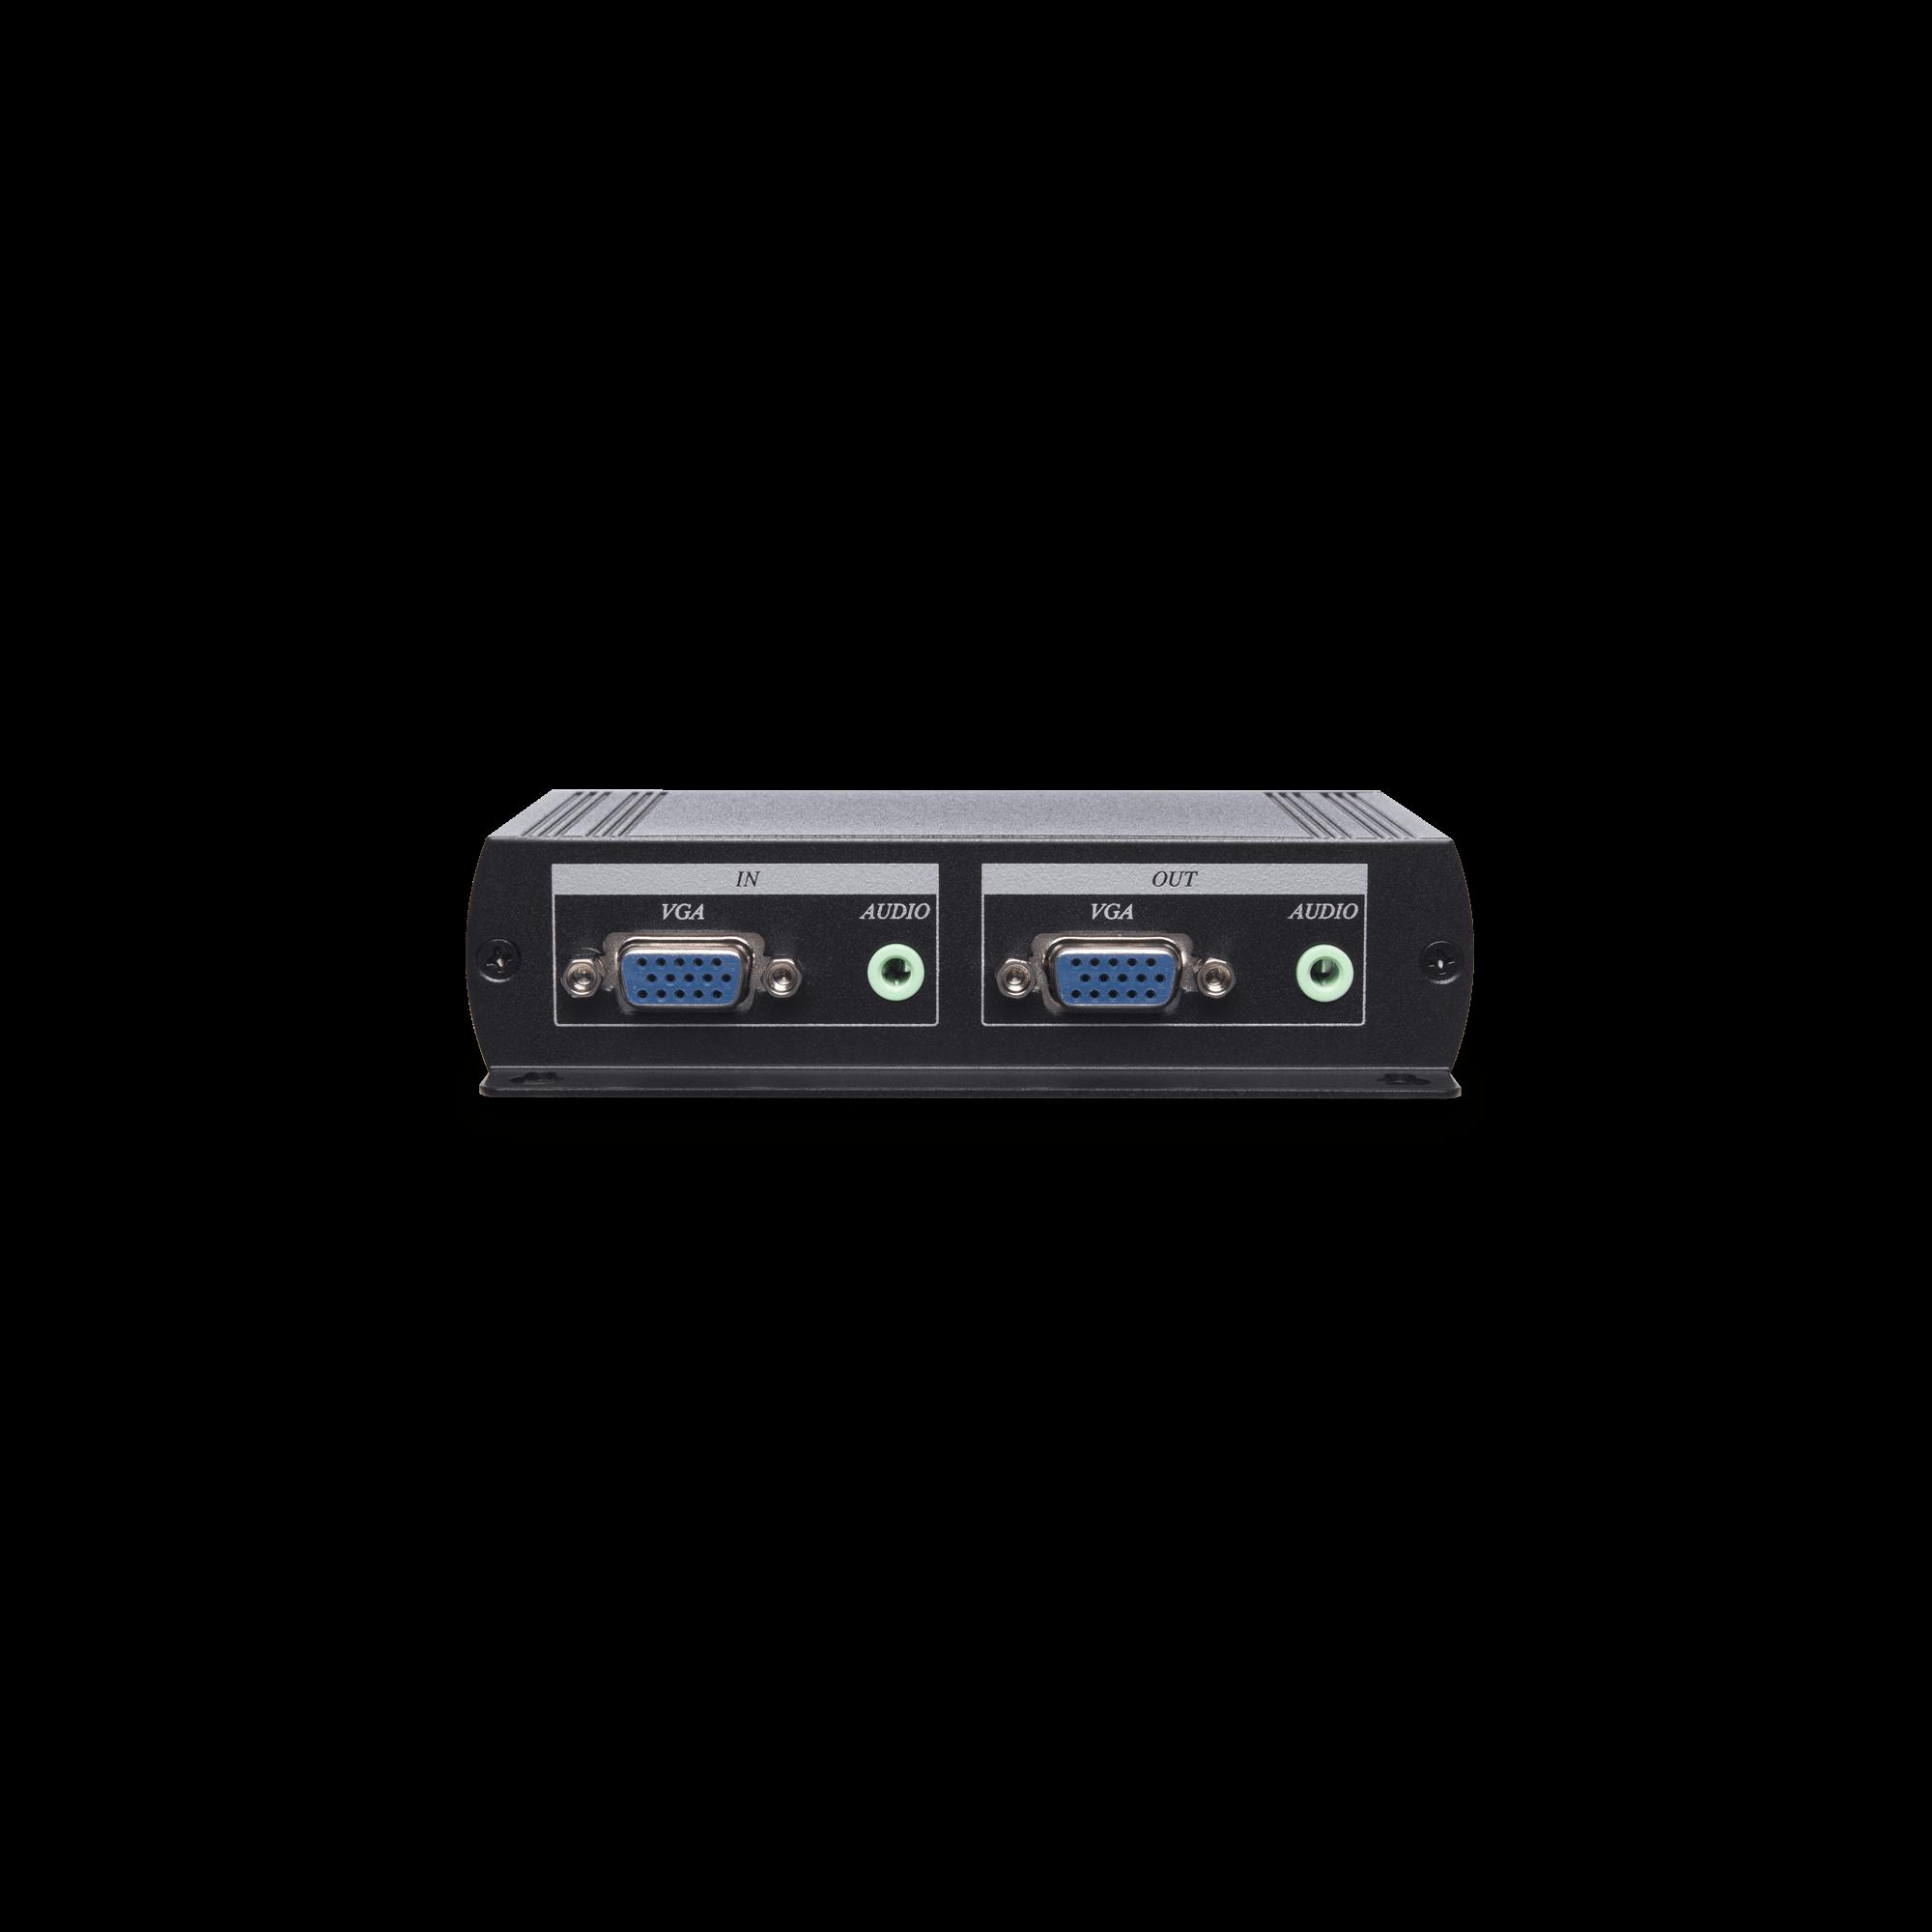 1 x 3 VGA & Stereo Audio Distribution Amplifier CAT5e Extender